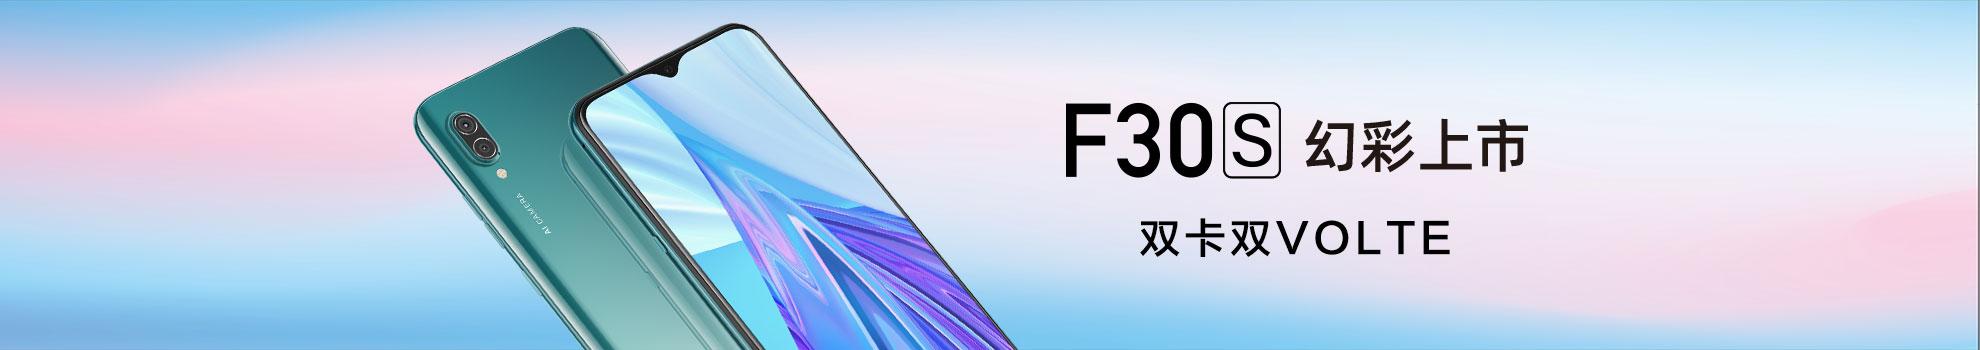 F30S幻彩手机 支持双卡双VoLTE!